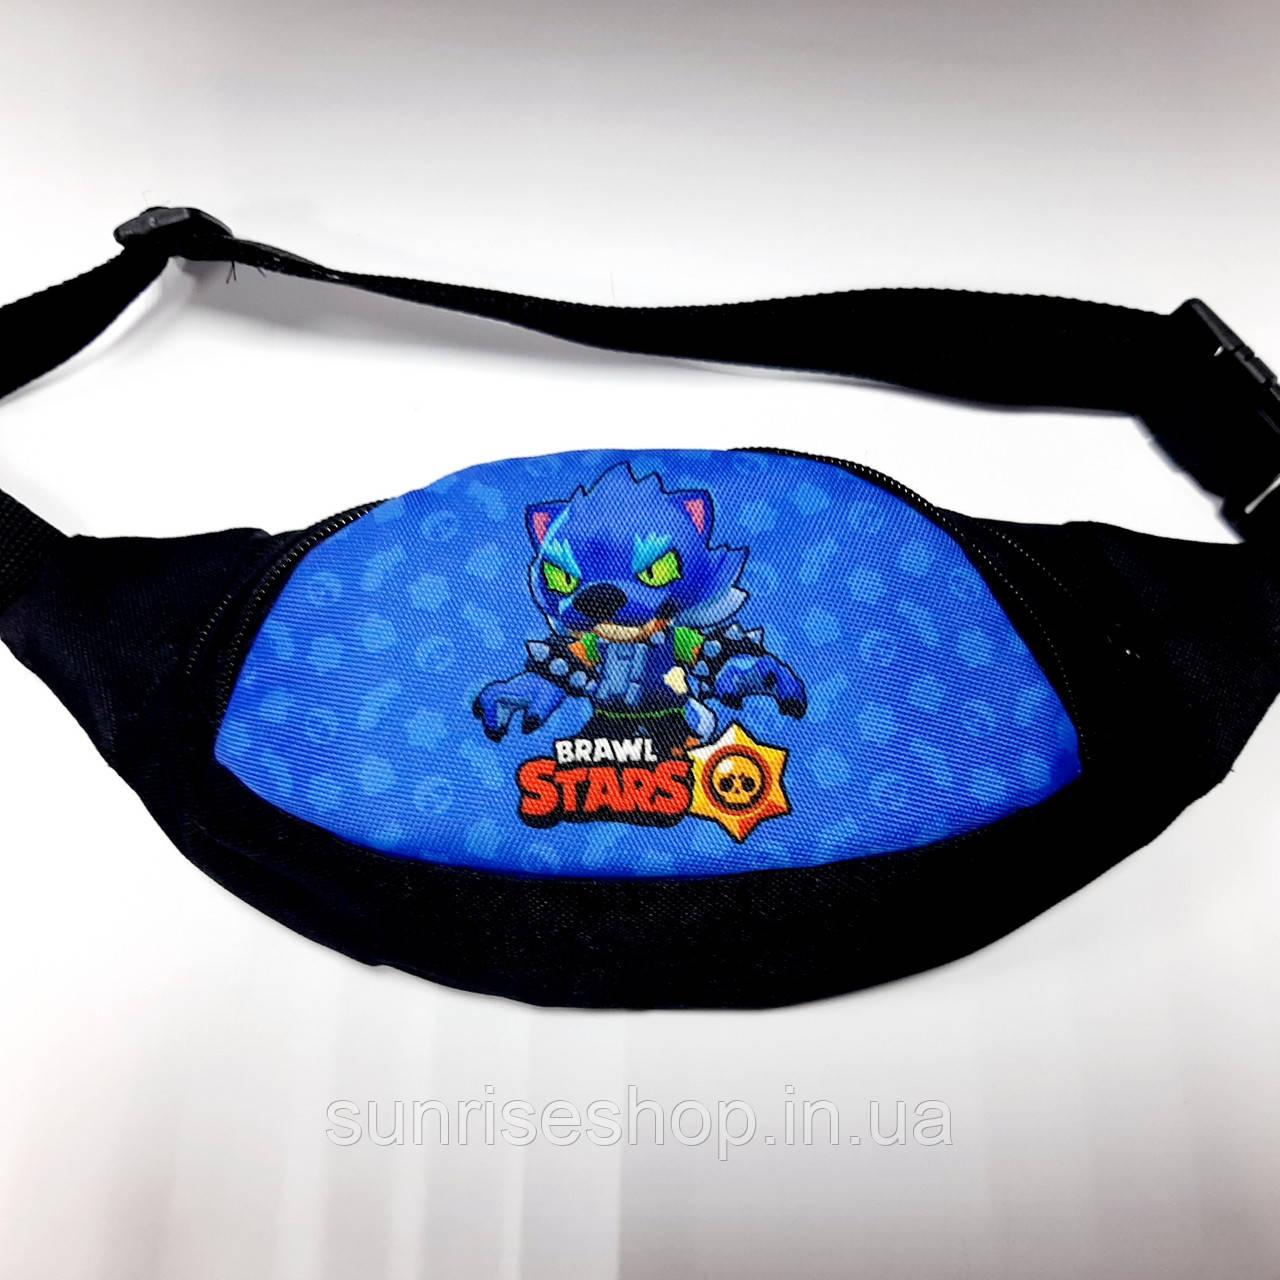 Поясная детская сумка бананка Brawl Stars опт